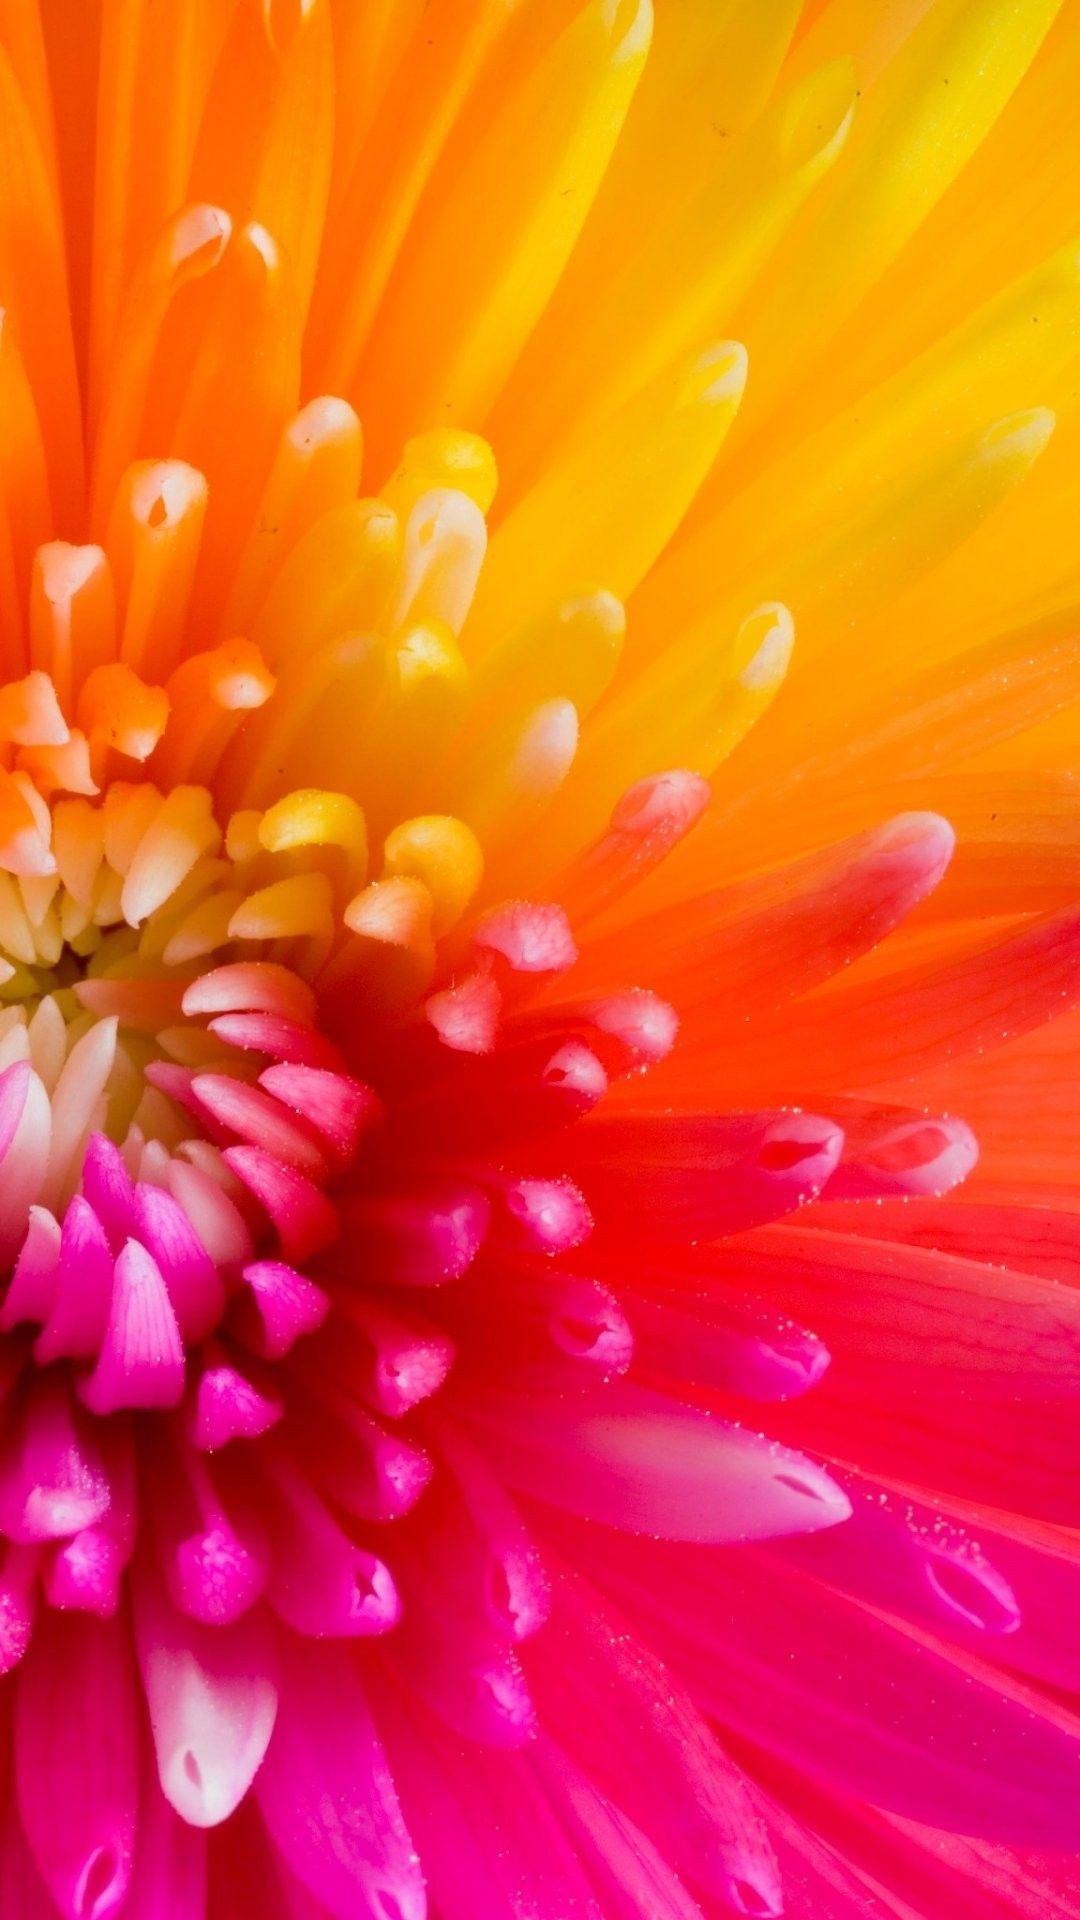 Flower Iphone 6 Plus Wallpapers Top Free Flower Iphone 6